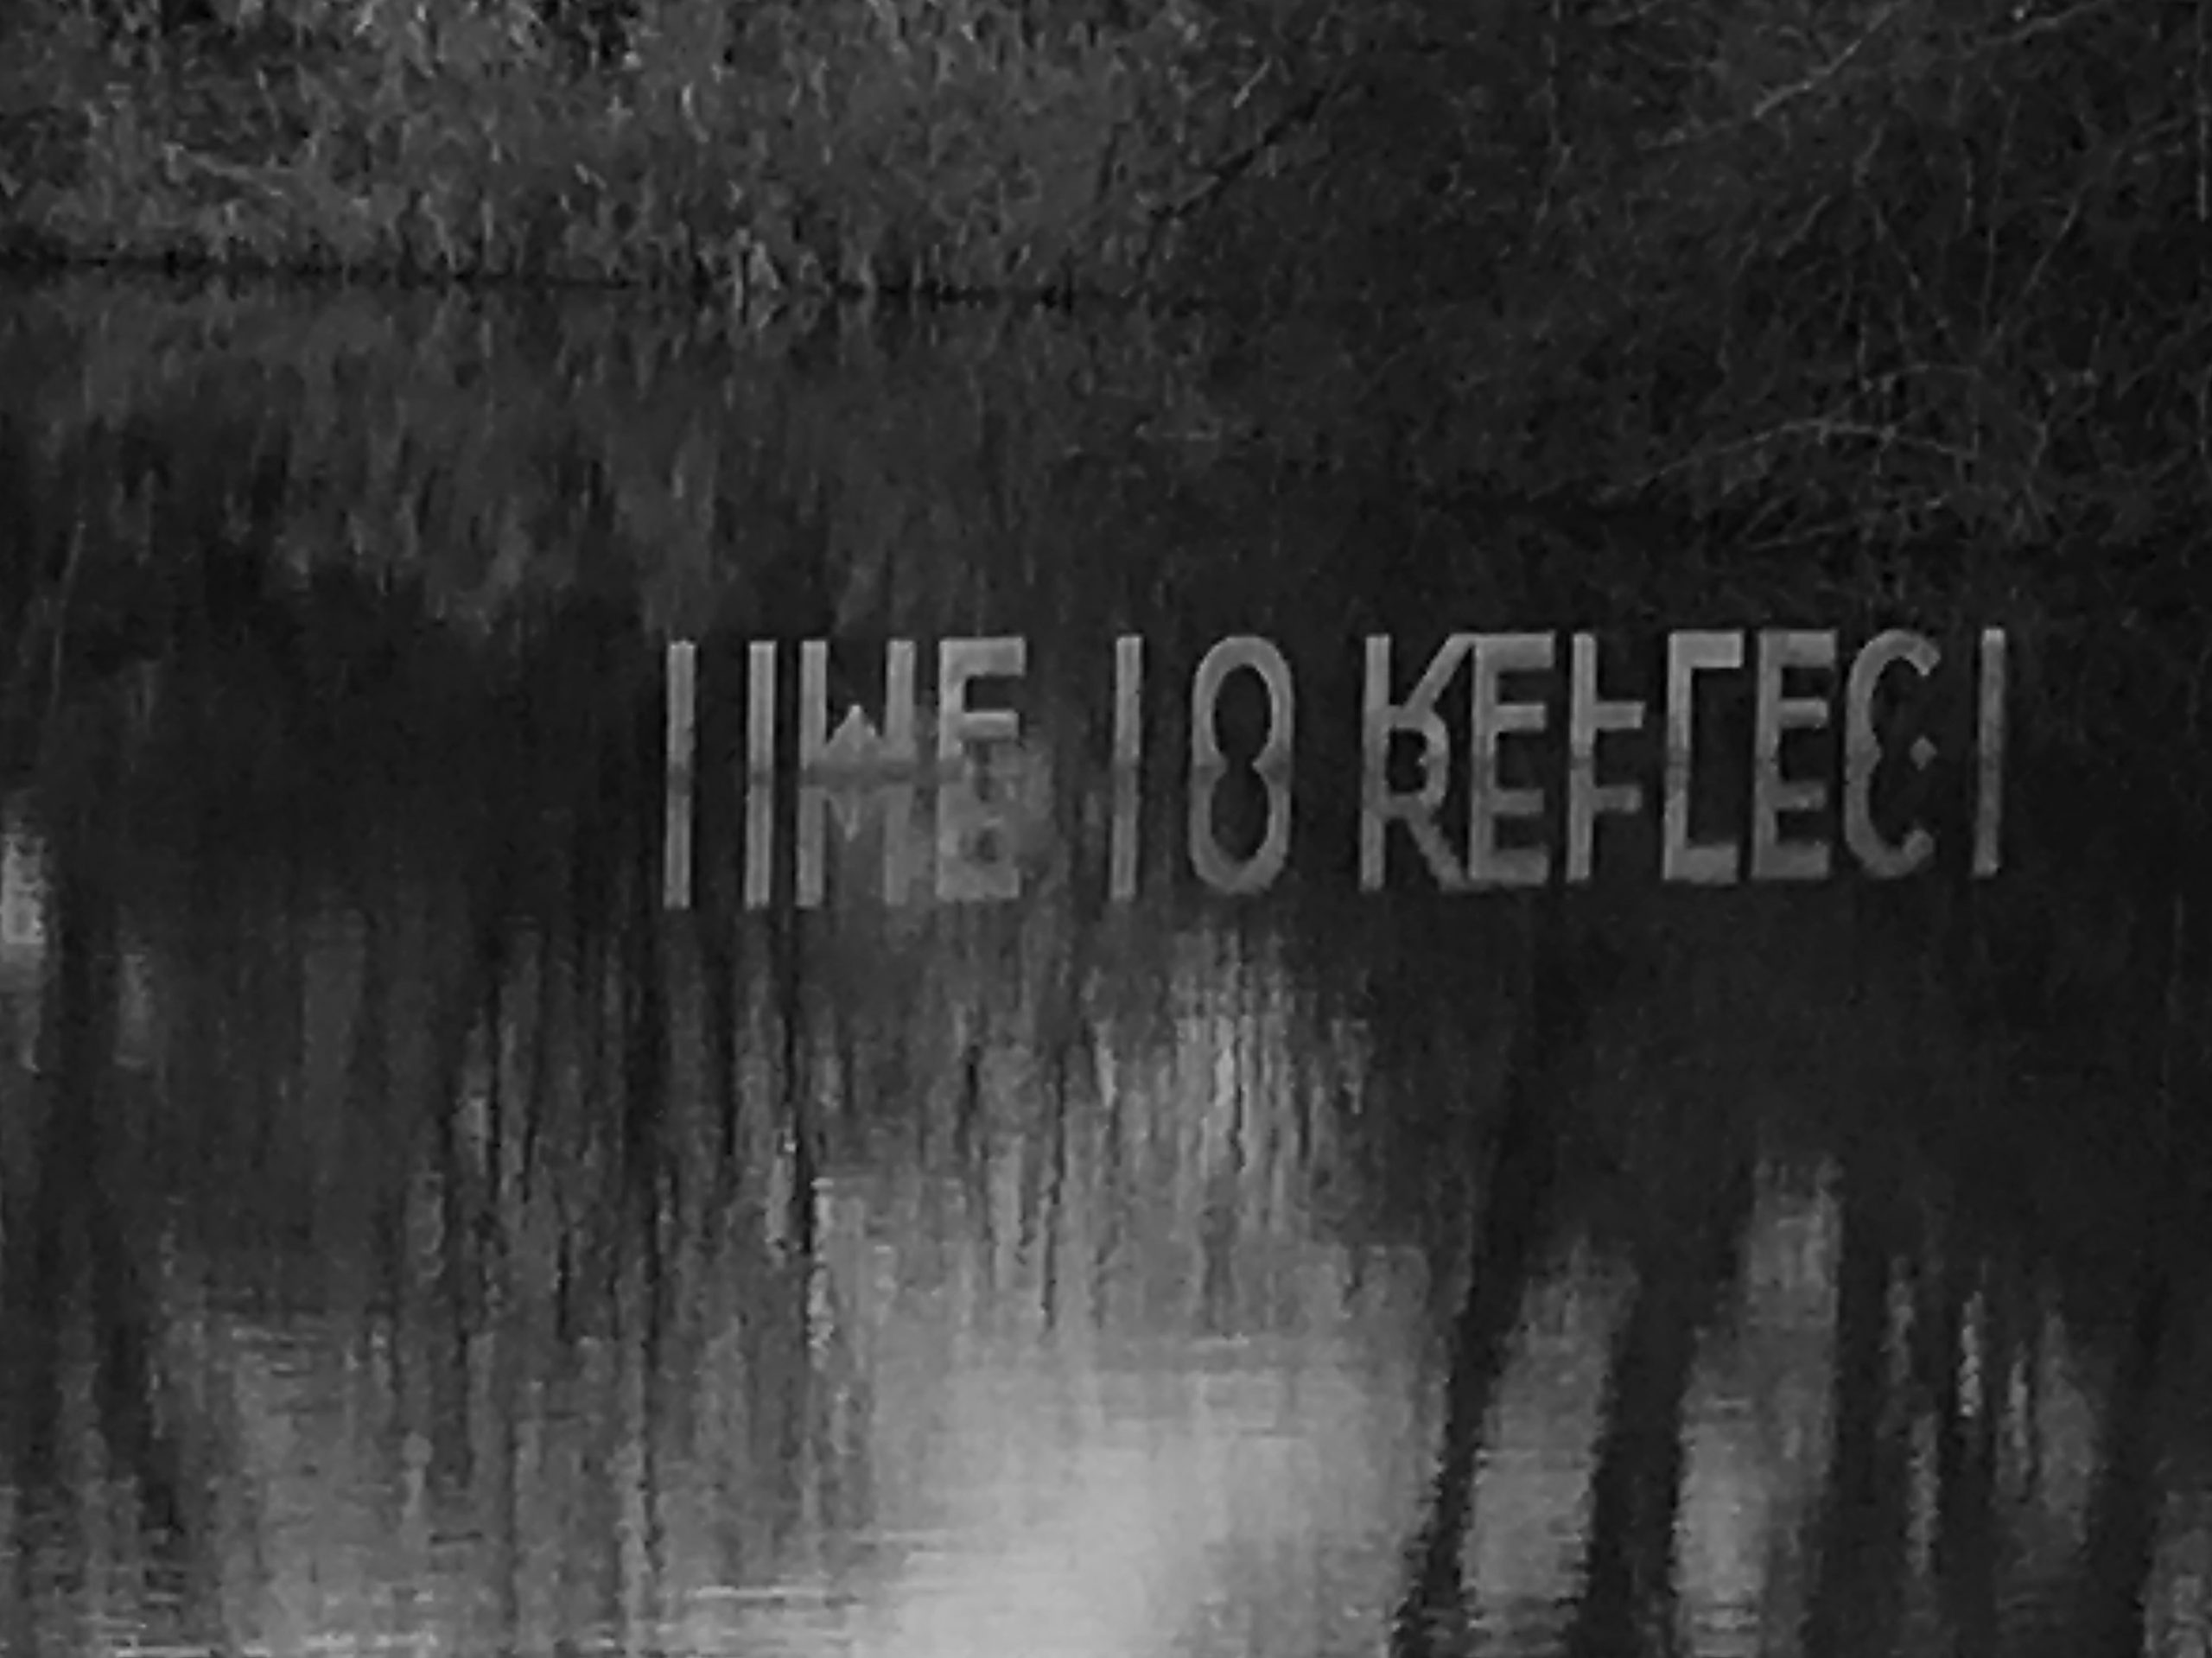 Sheela Hobden www.bluegreencoaching.com Reflection